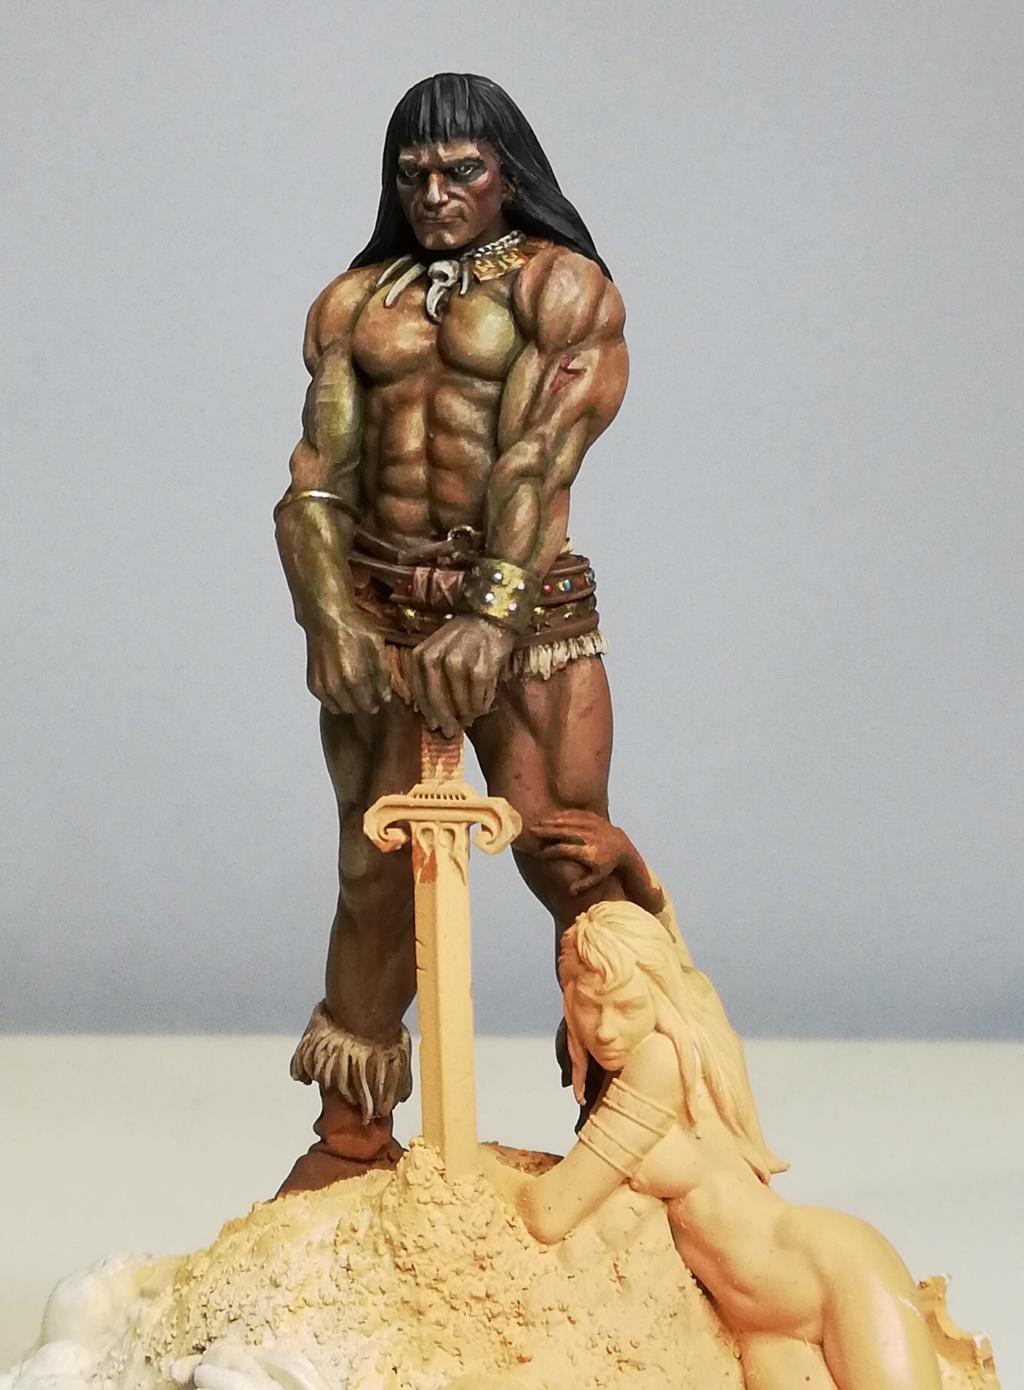 Conan, d'après Frazetta - Terminé Conan_25